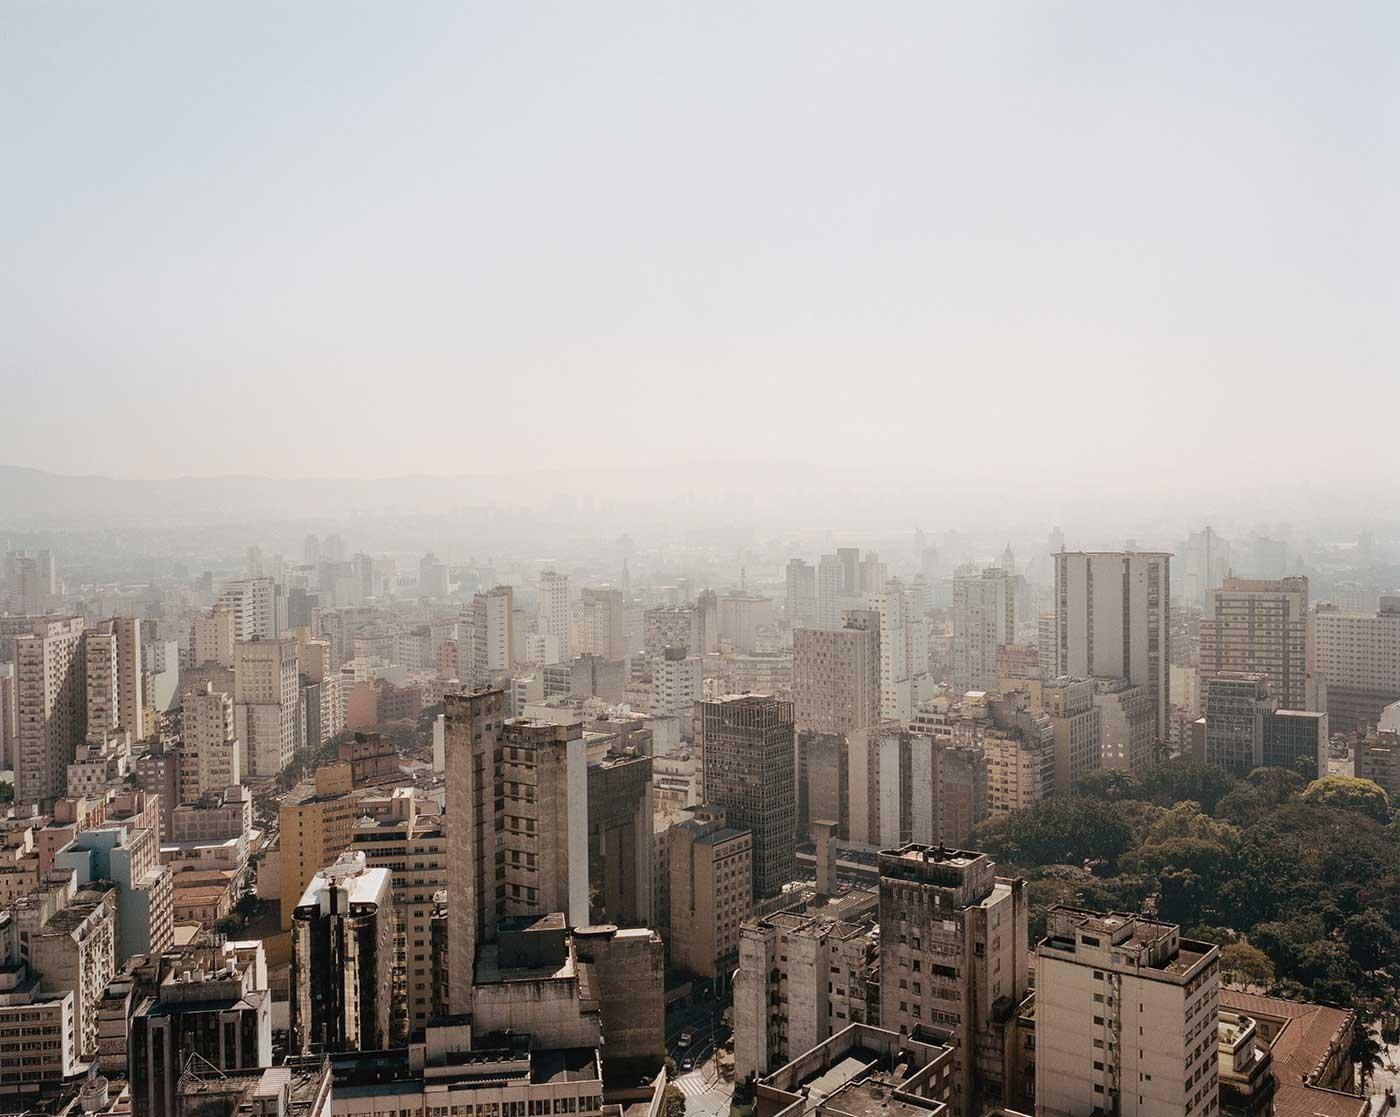 Ryan Debolski - São Paulo